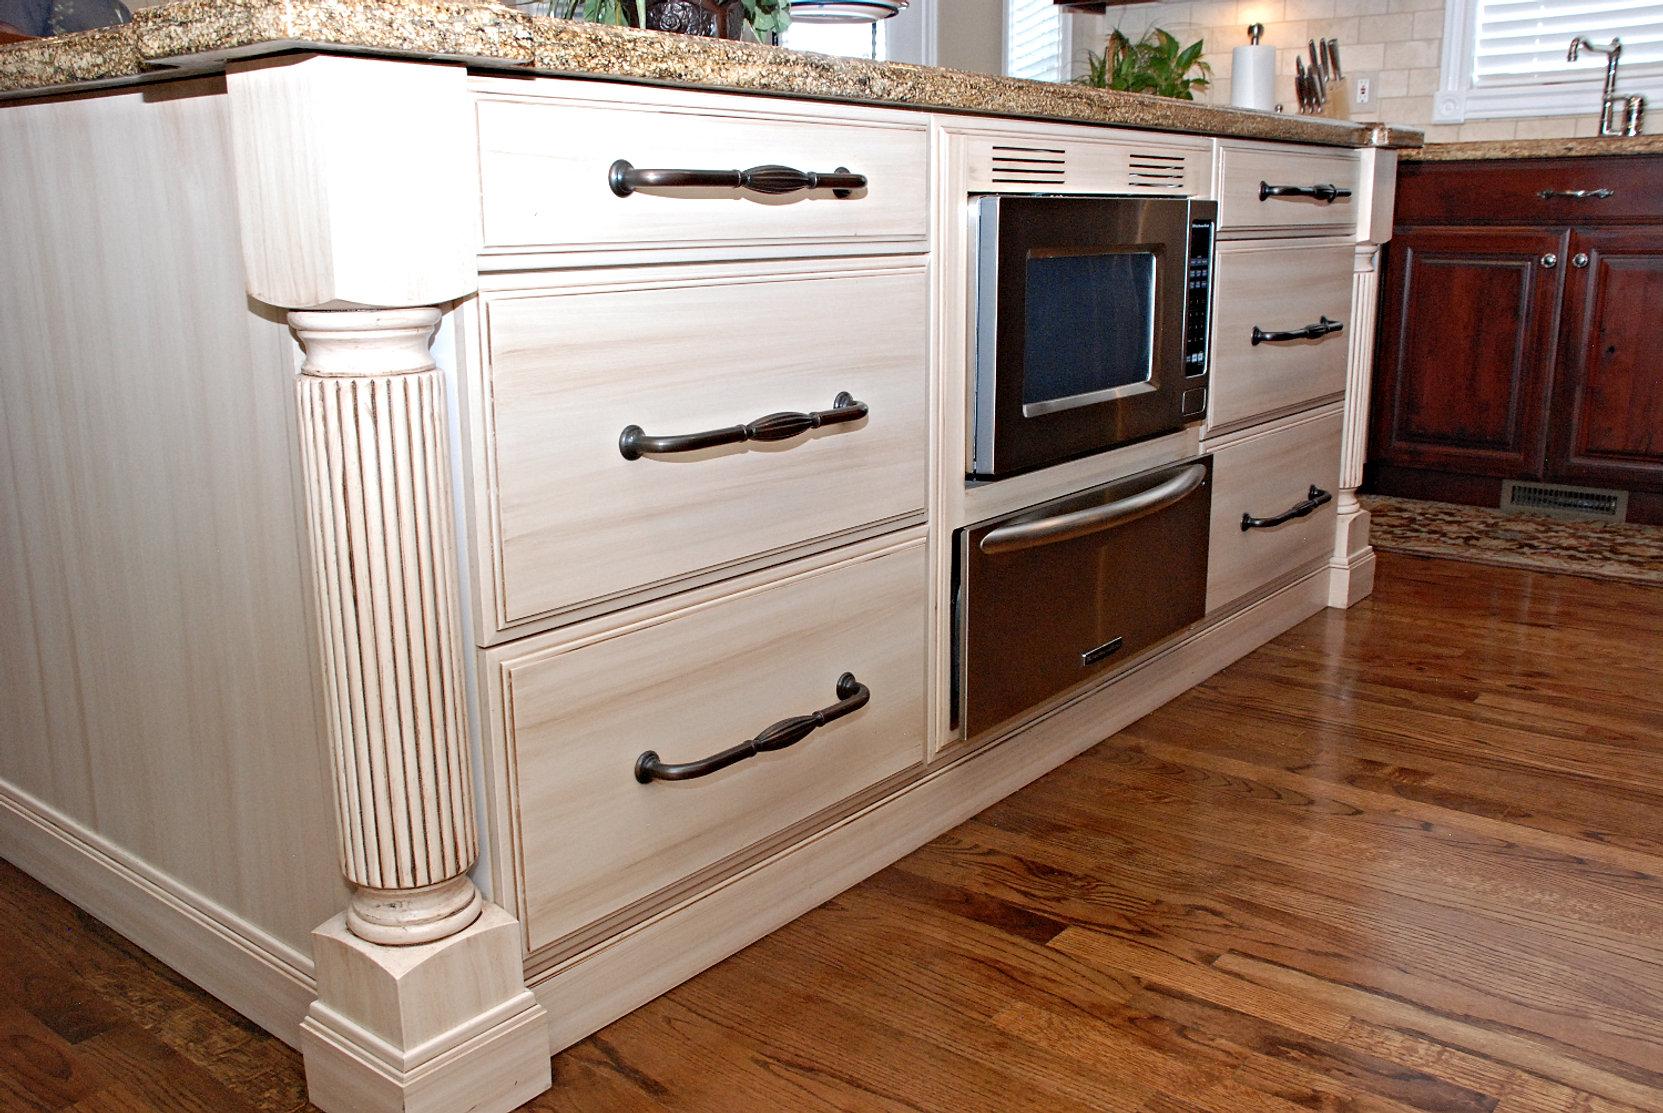 marvelous kitchen etc nice look